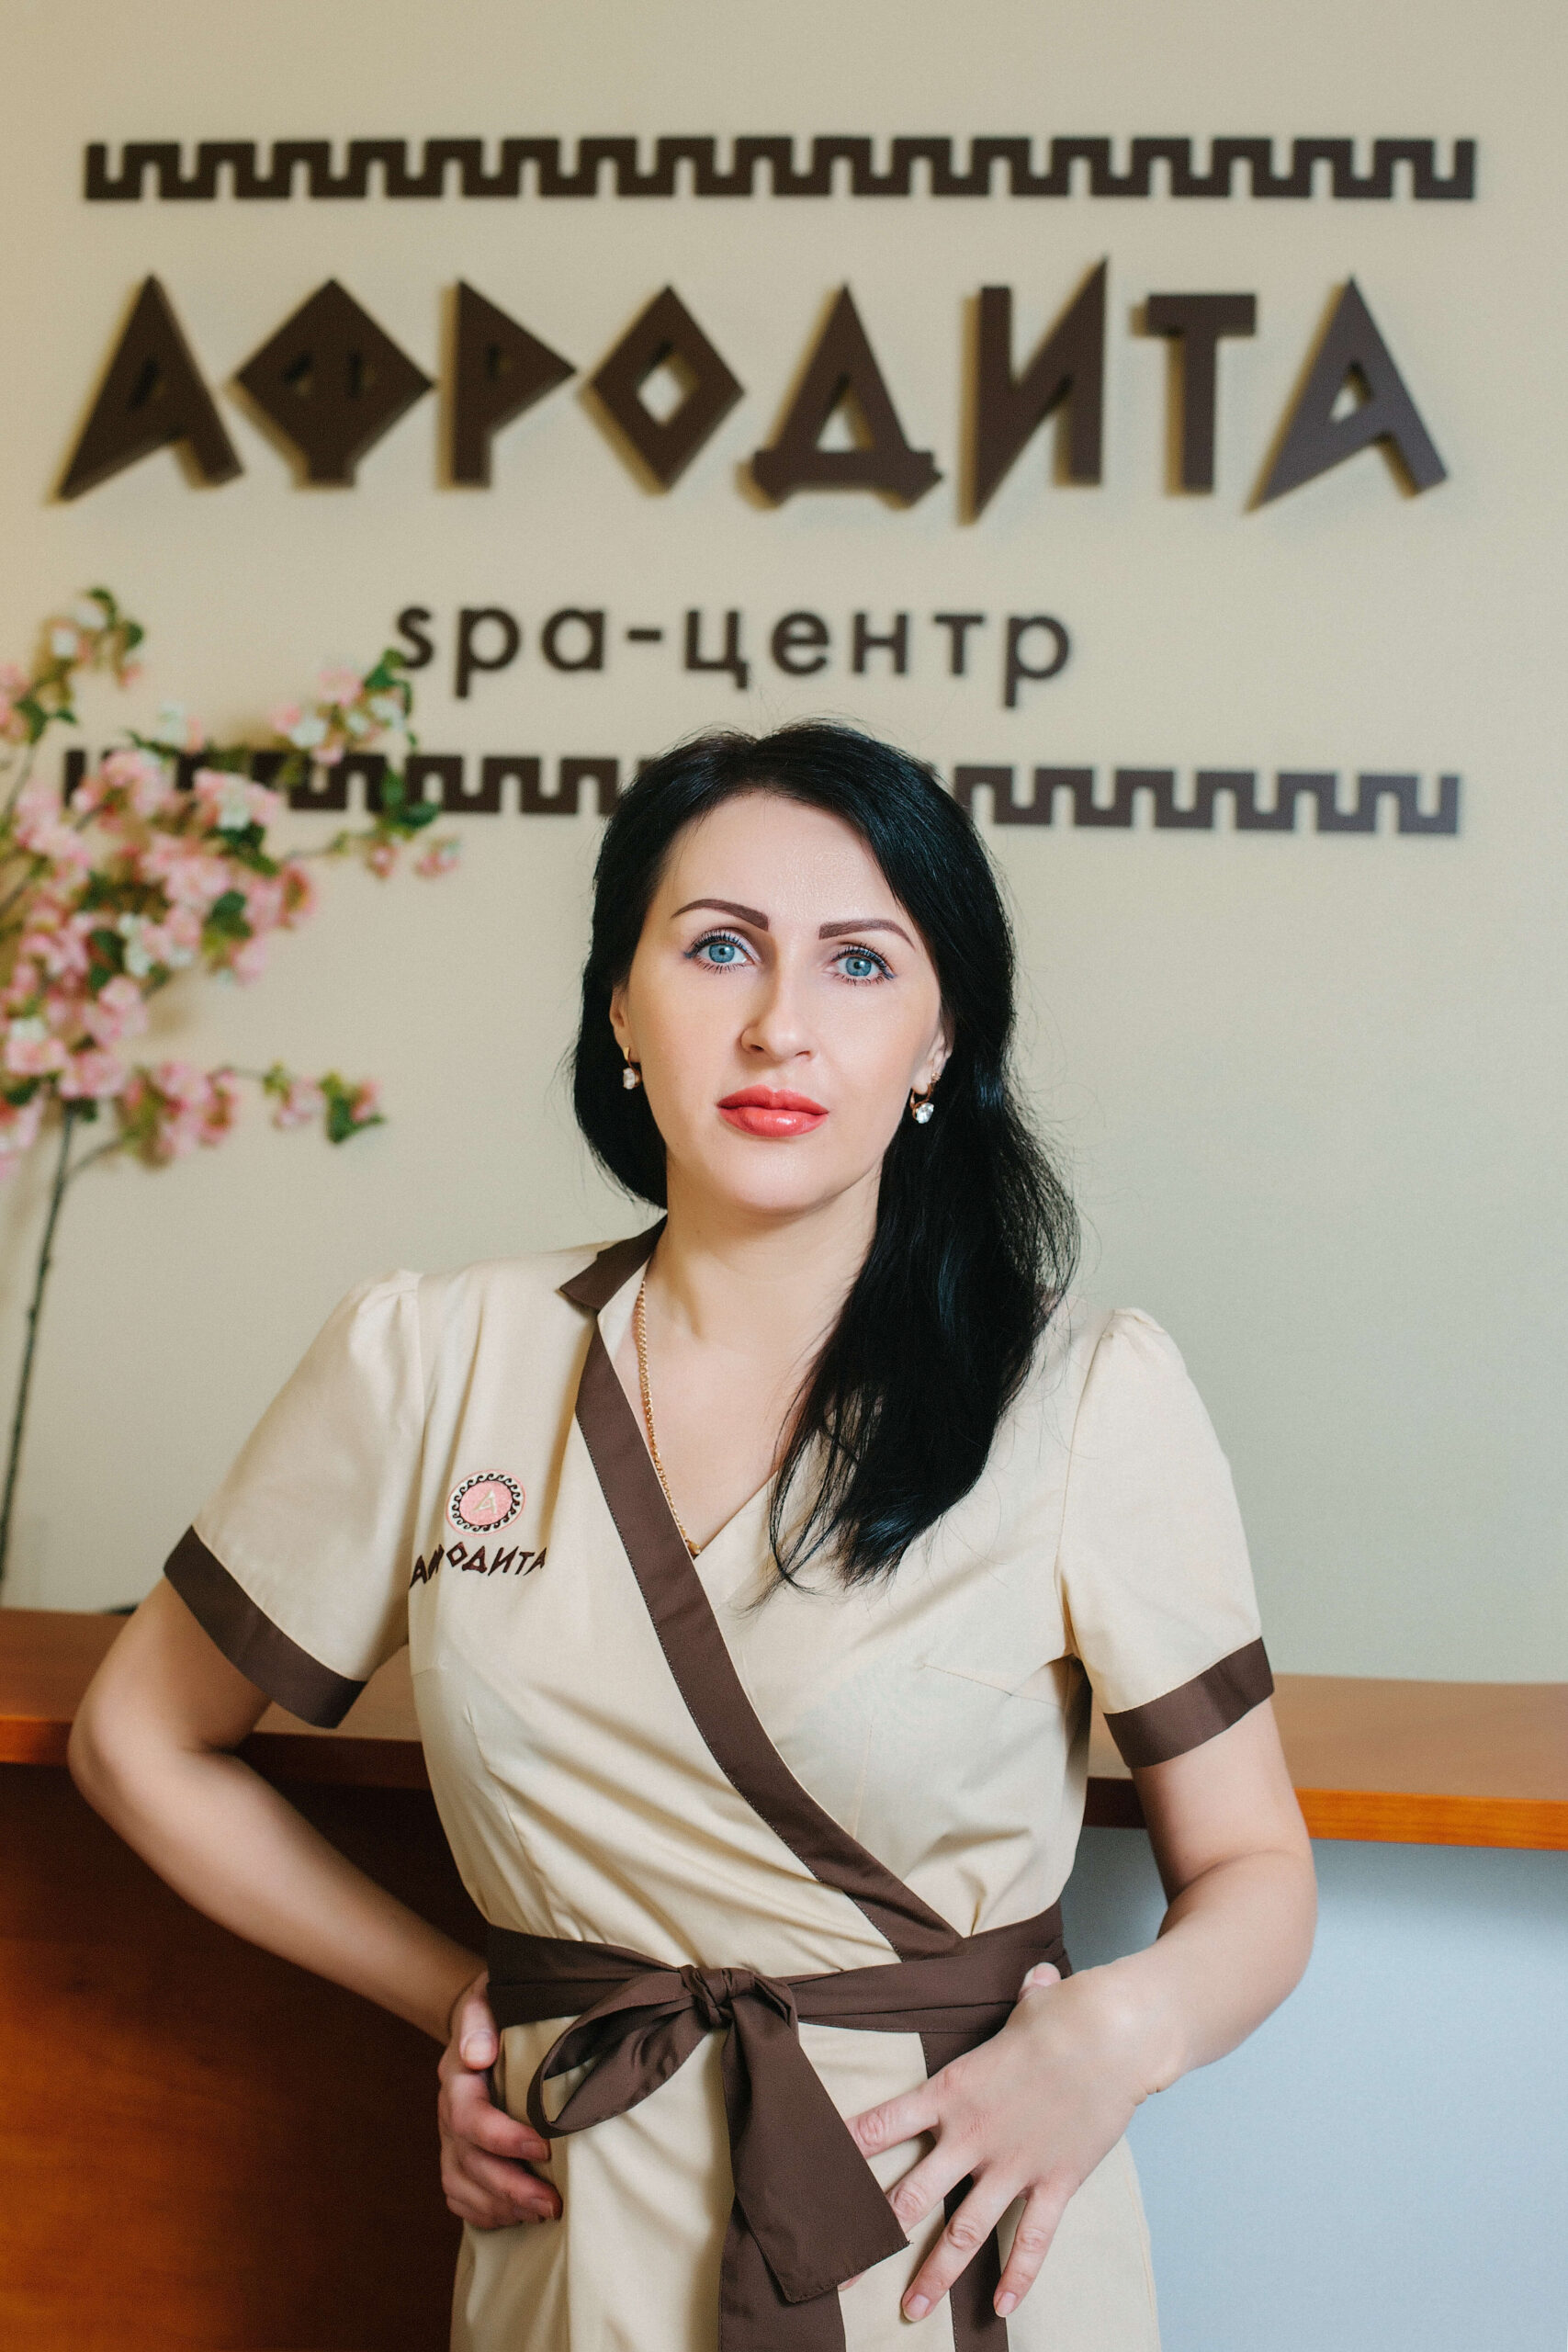 Косметолог Наталья в спа-салоне Афродита